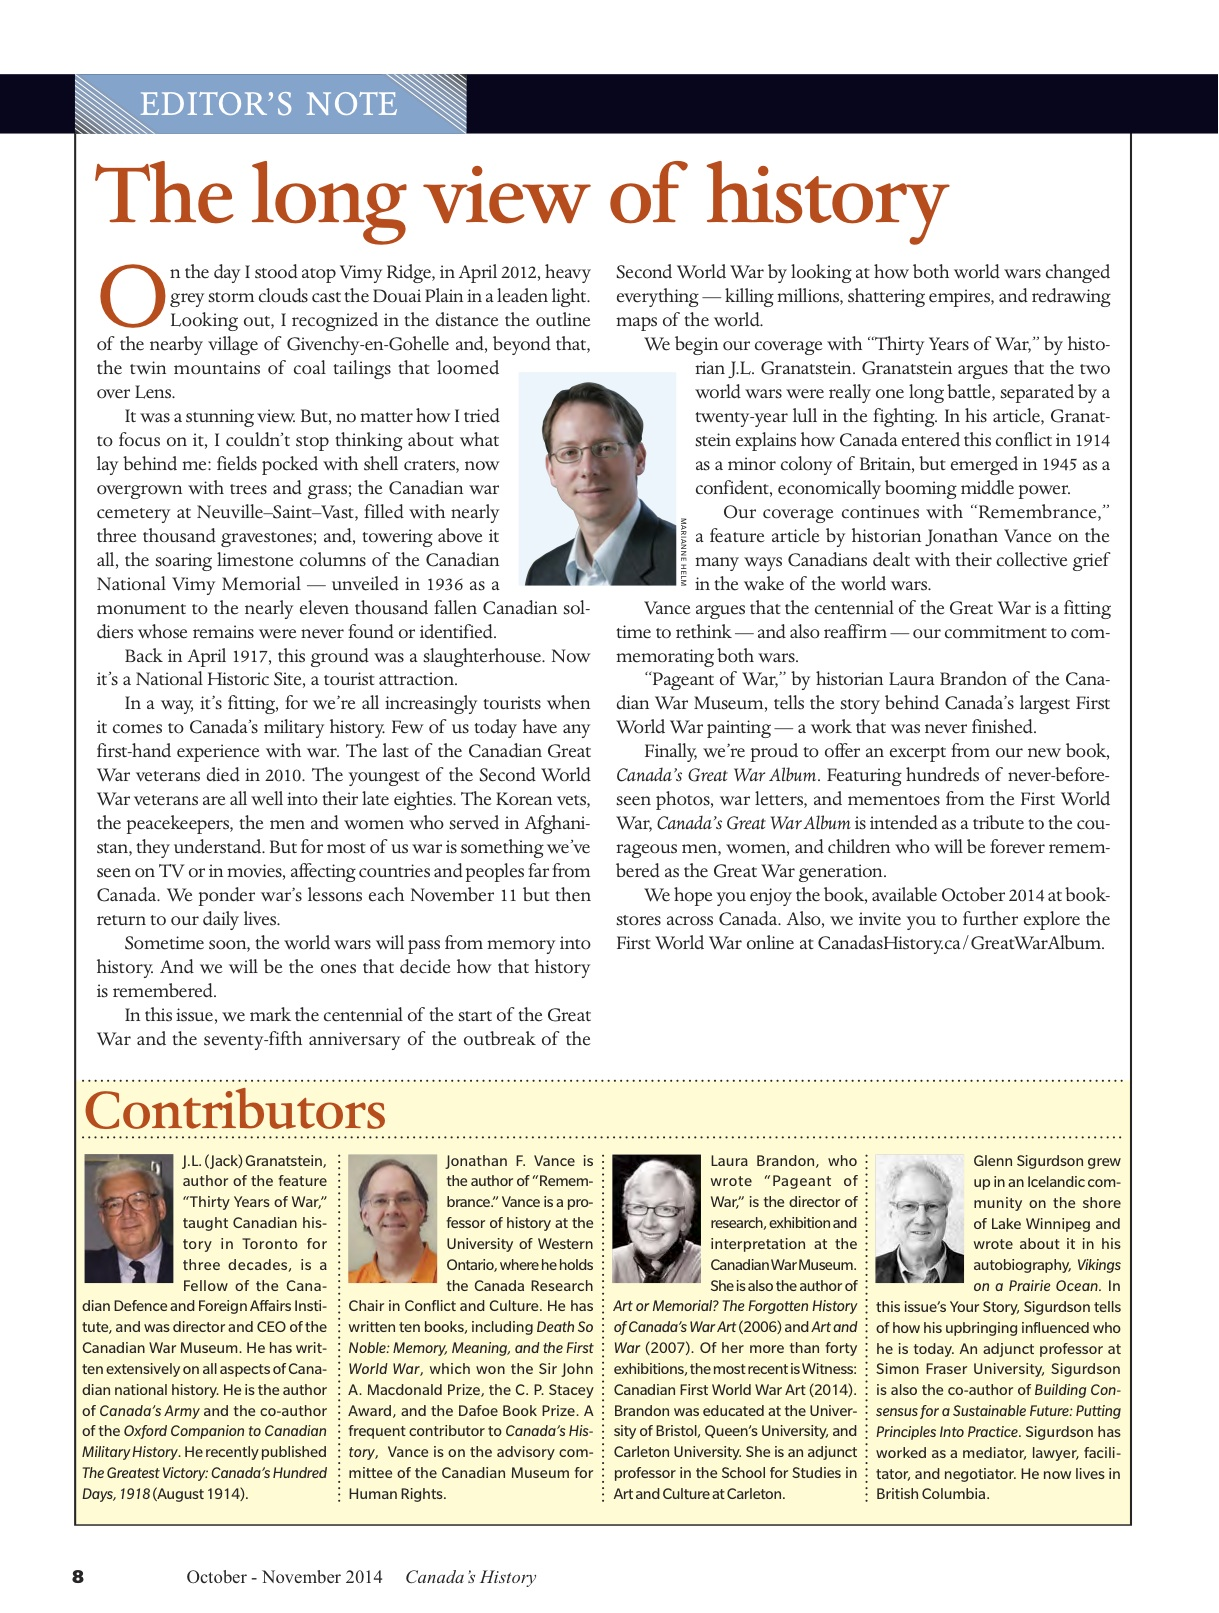 Canada's History editor's note OctNov14